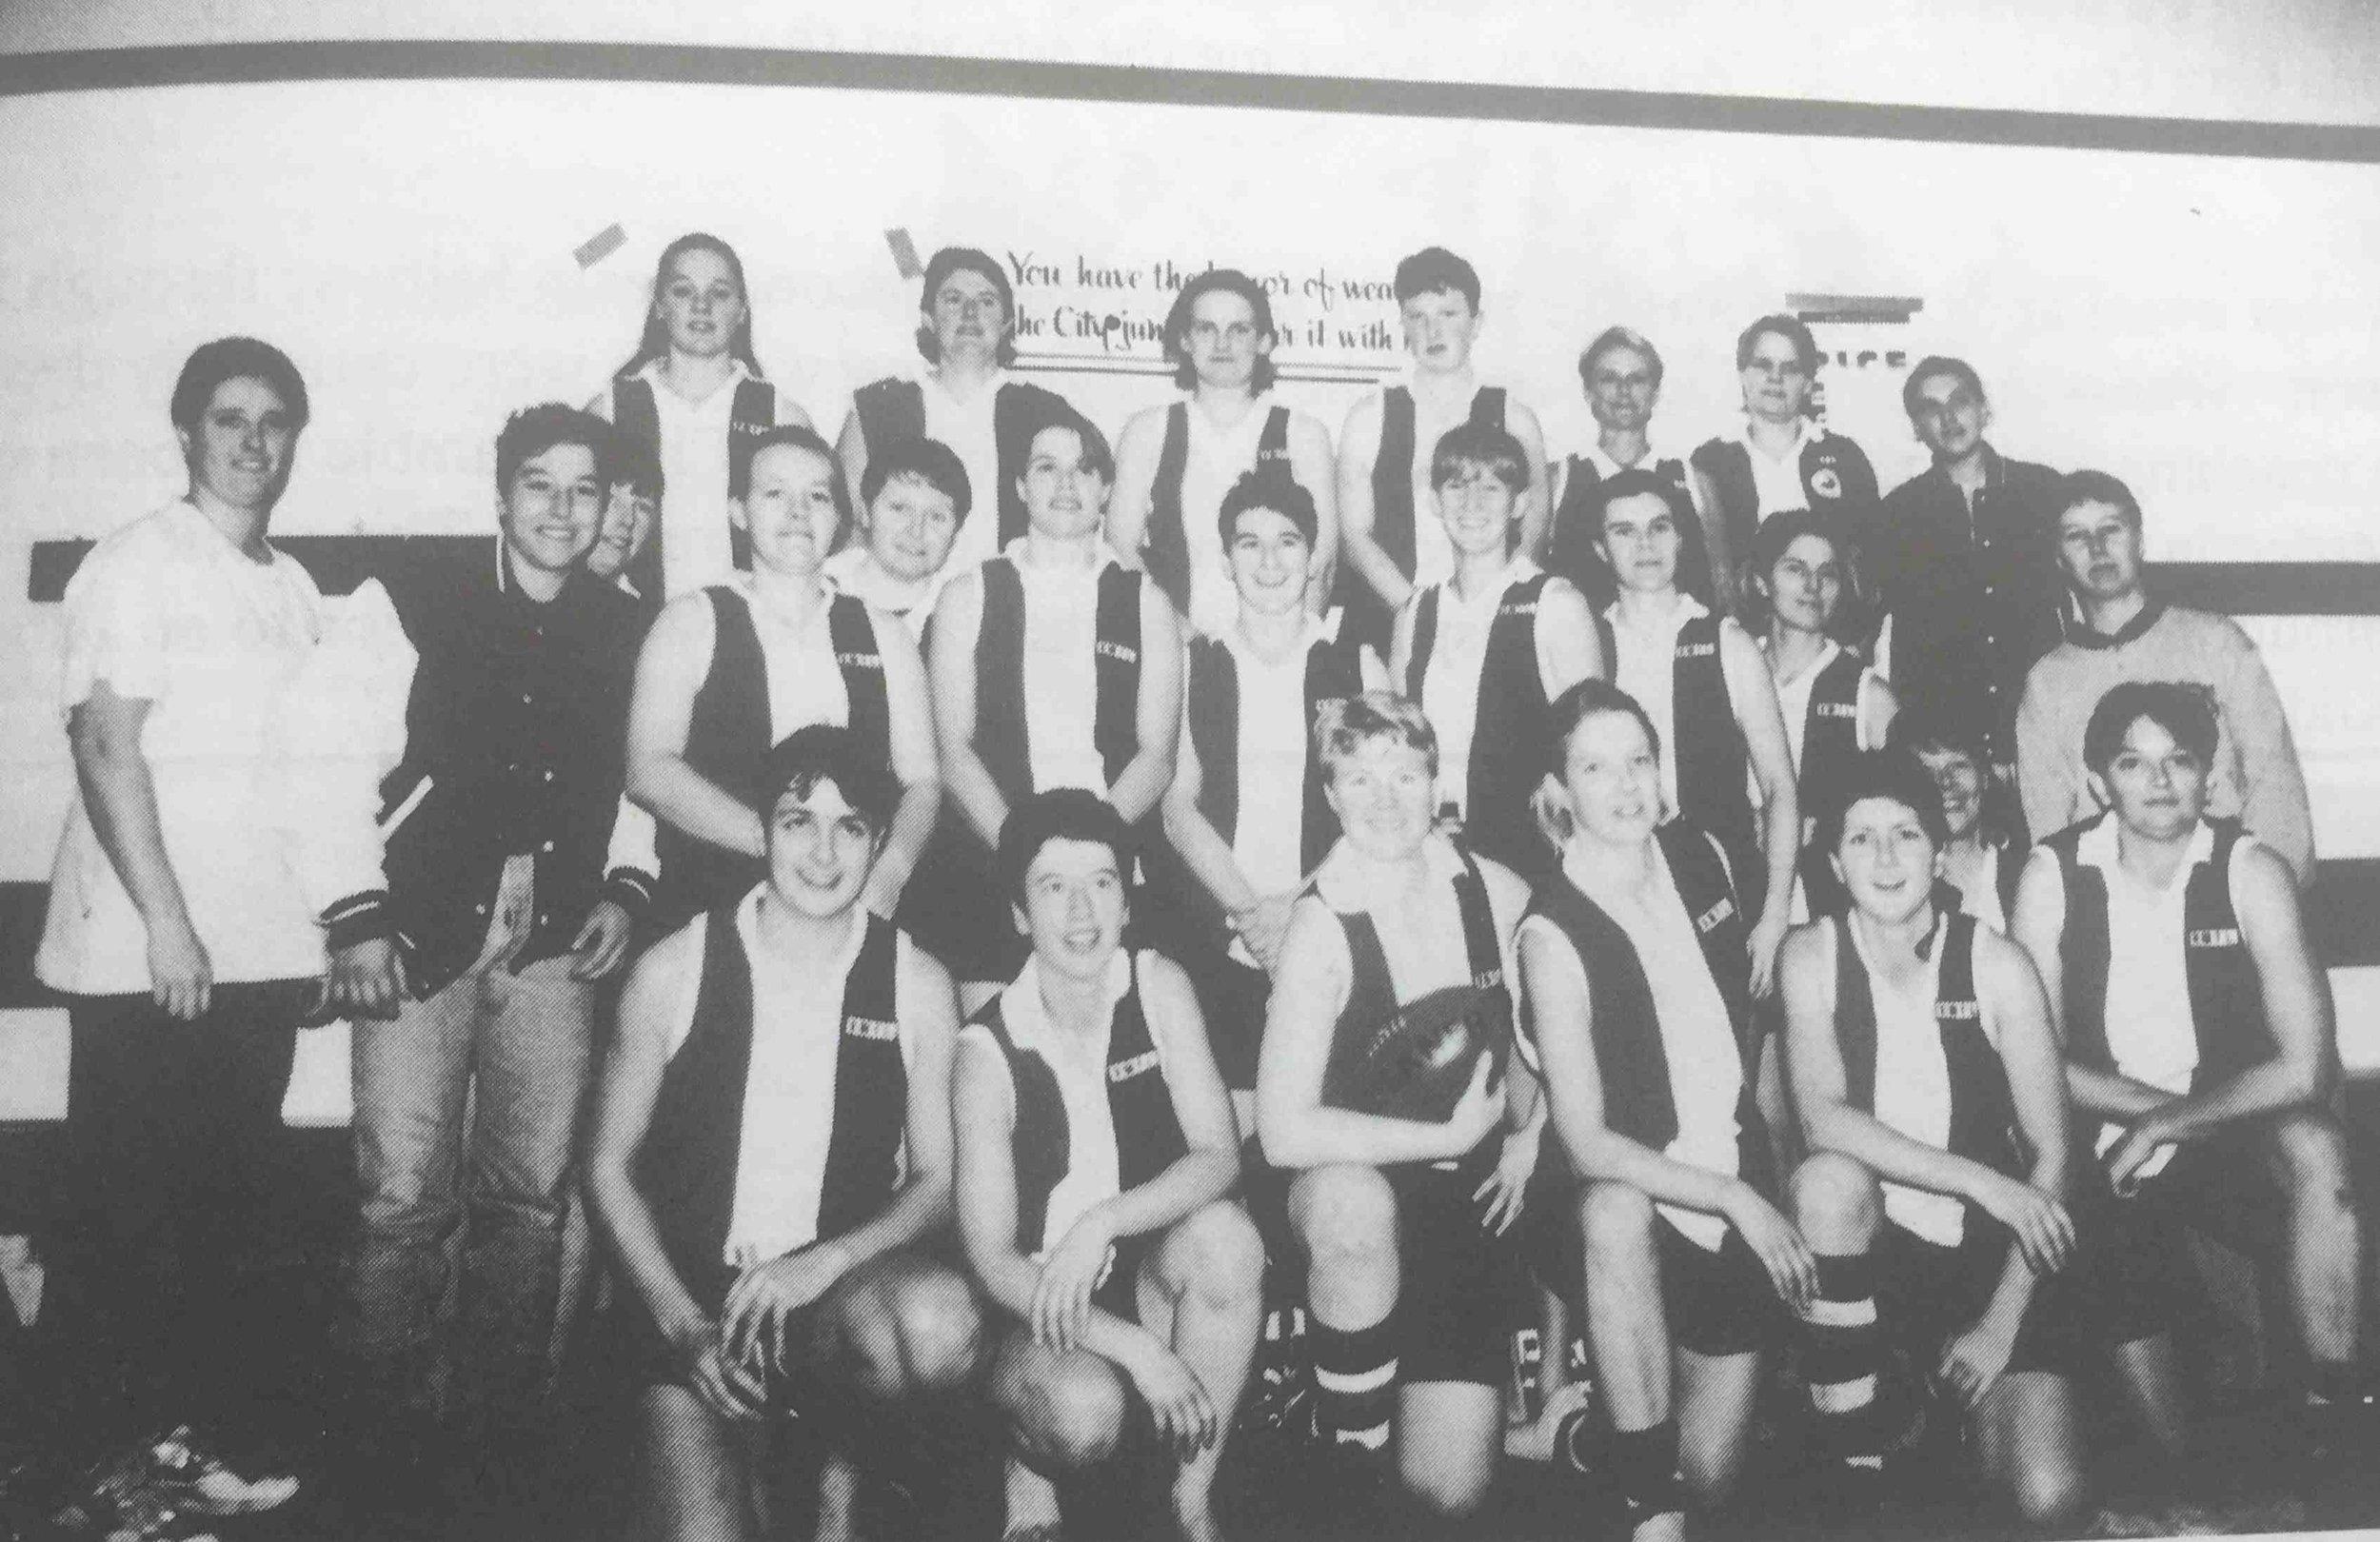 St Kilda Sharks Women's Football team, 1996